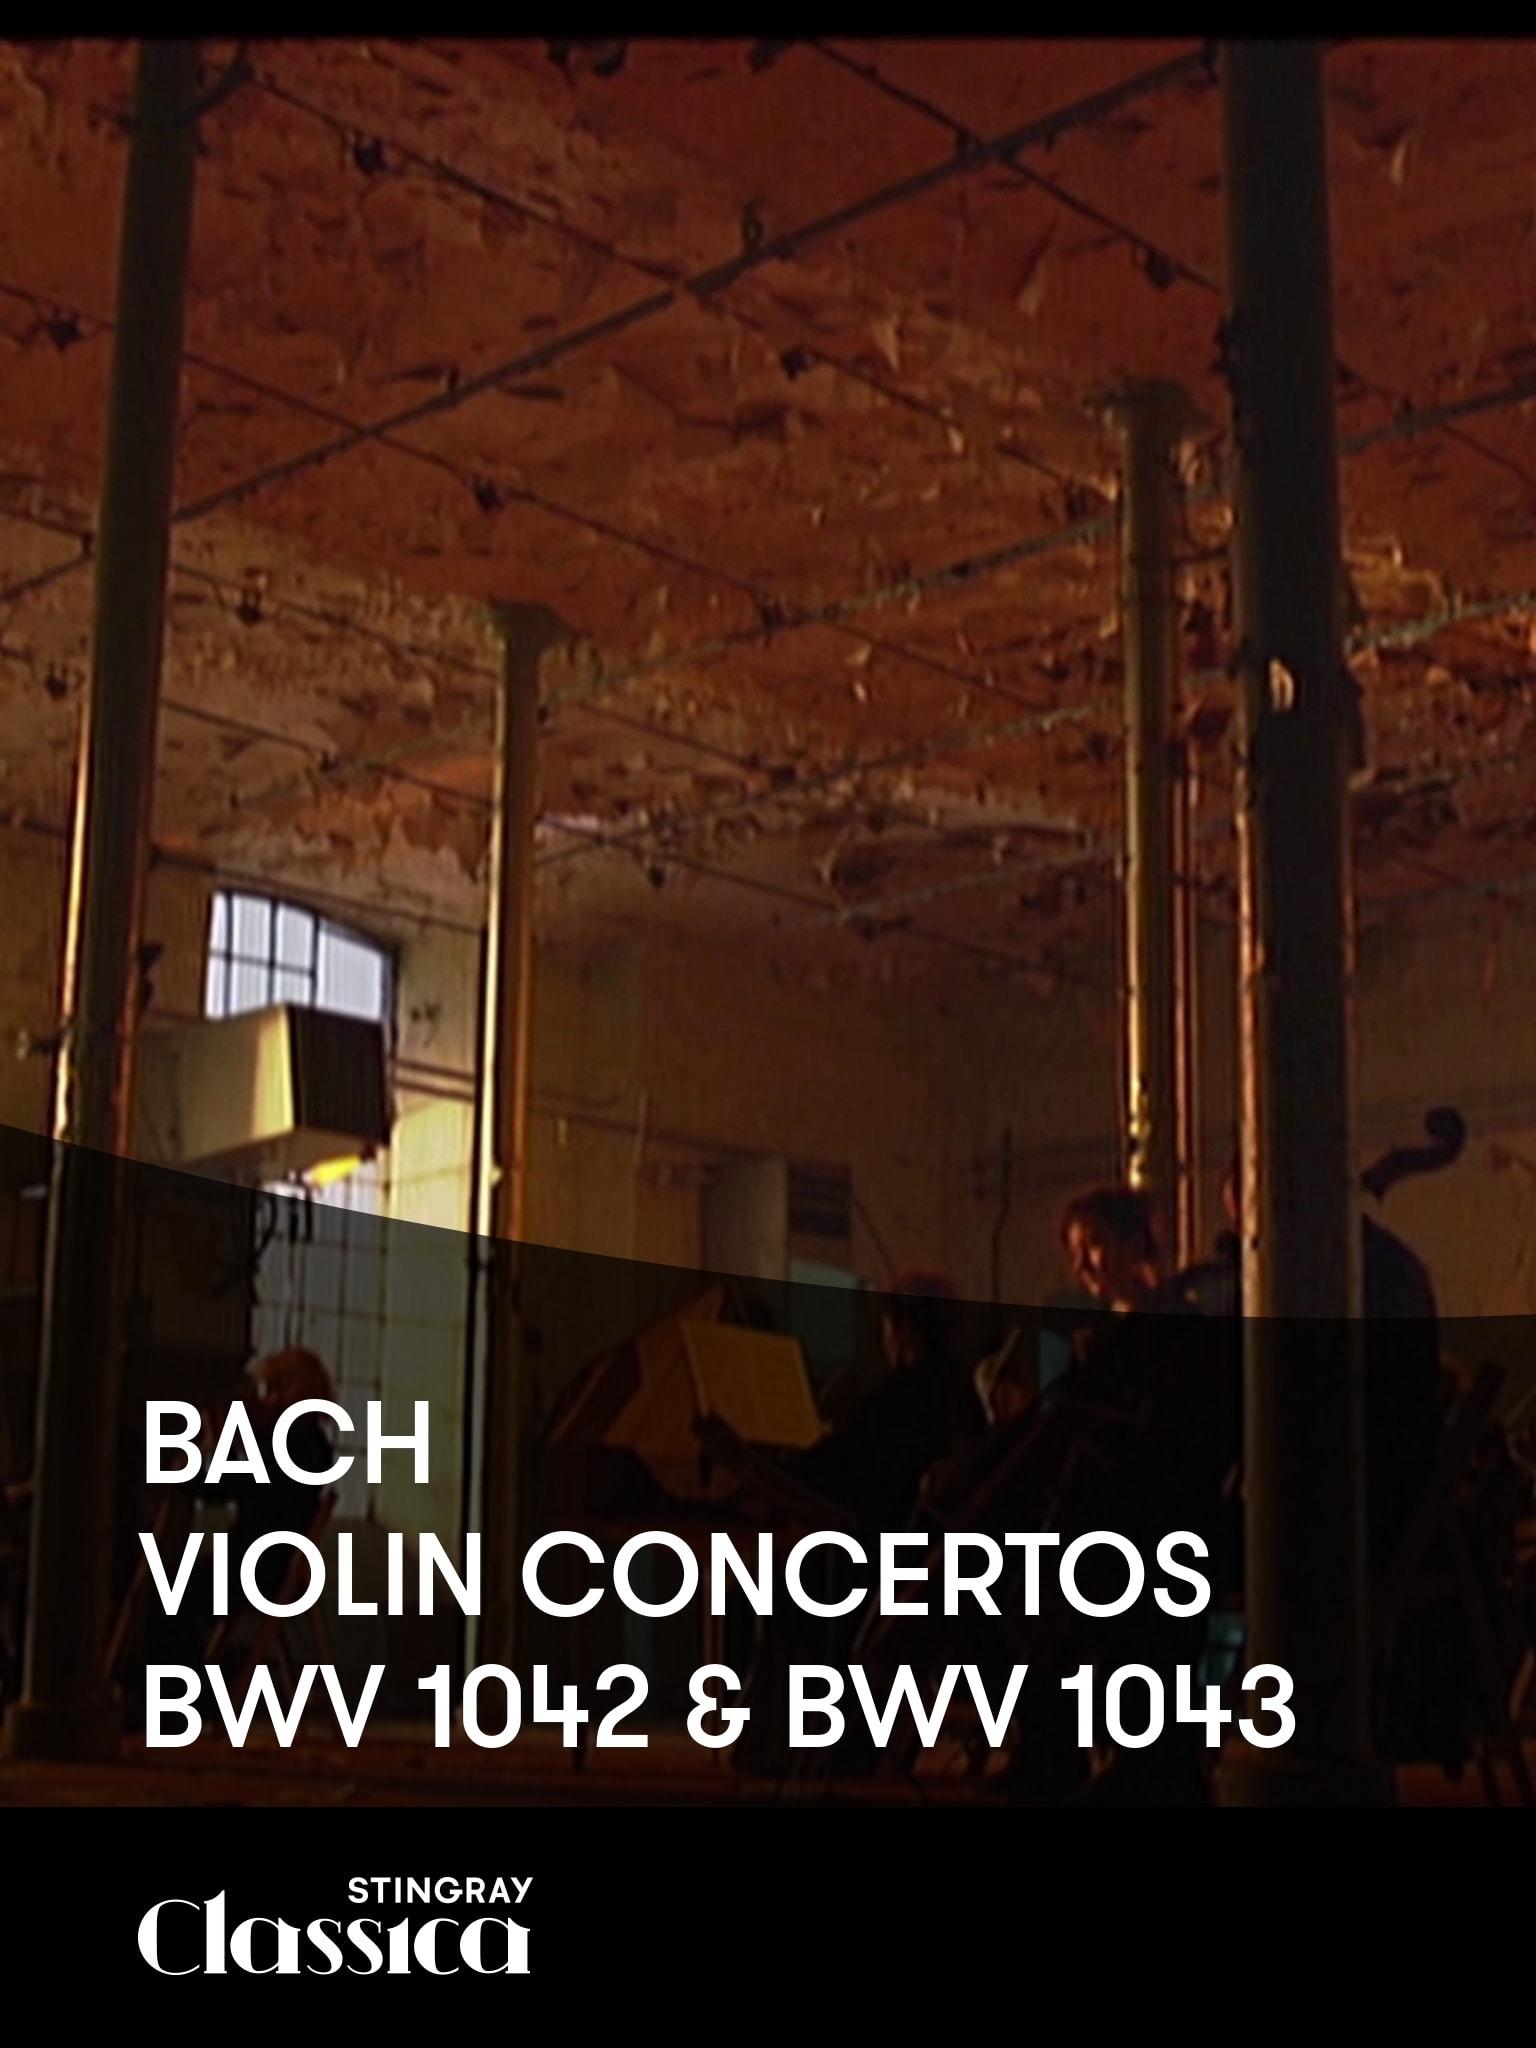 Bach - Violinkonzerte BWV 1042 and BWV 1043